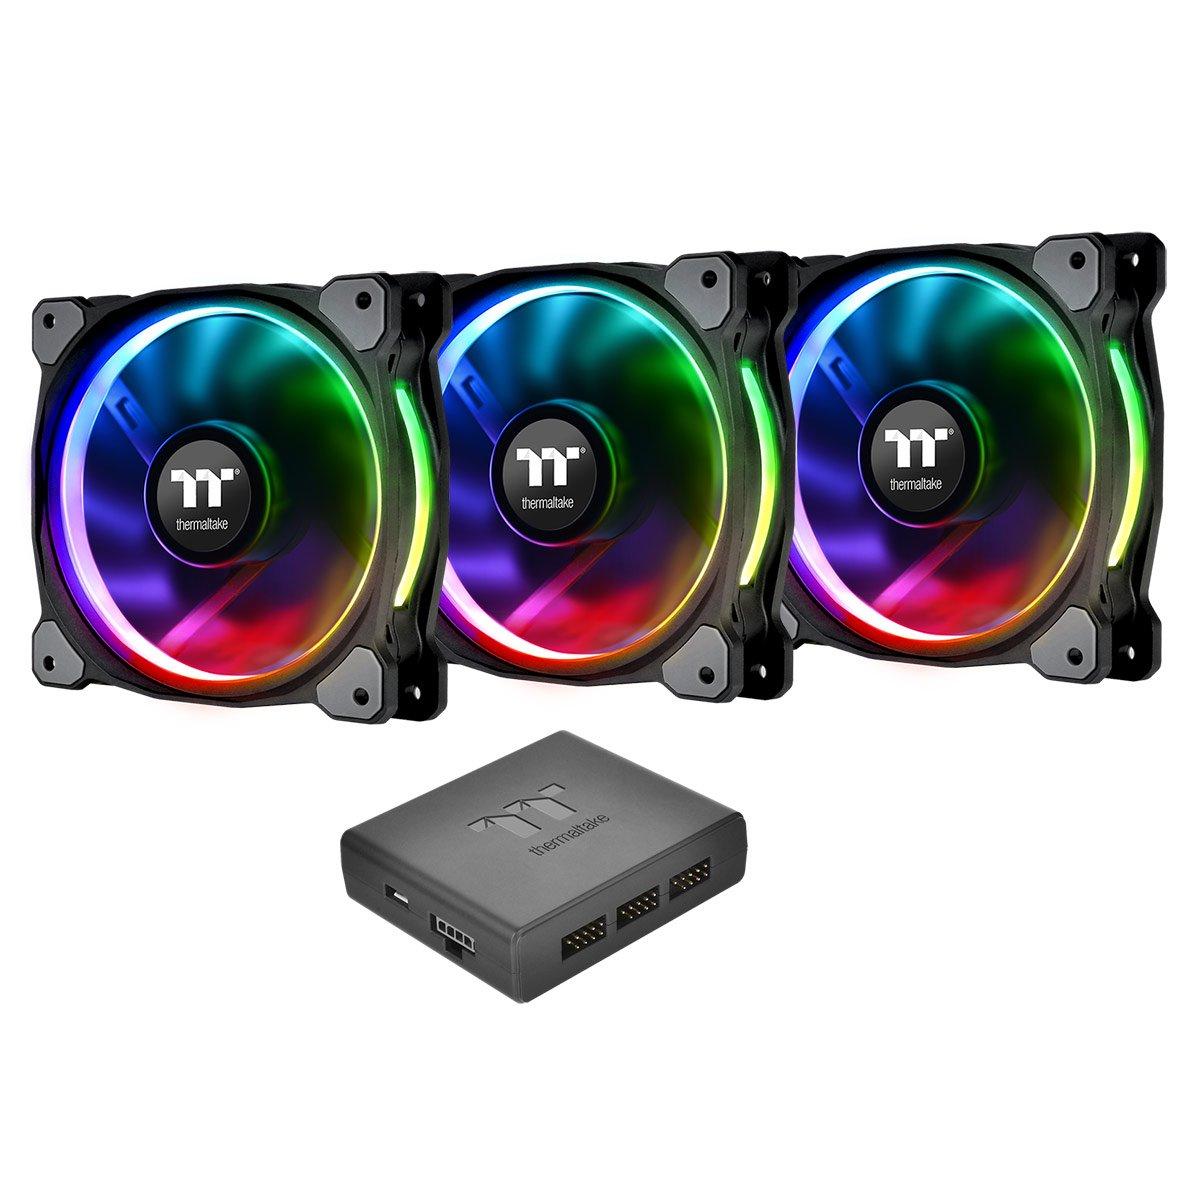 Thermaltake Riing PlusCooling Fan - Case - 3 x 120 mm - 3 - 1500 rpm - 3 x 48.3 CFM